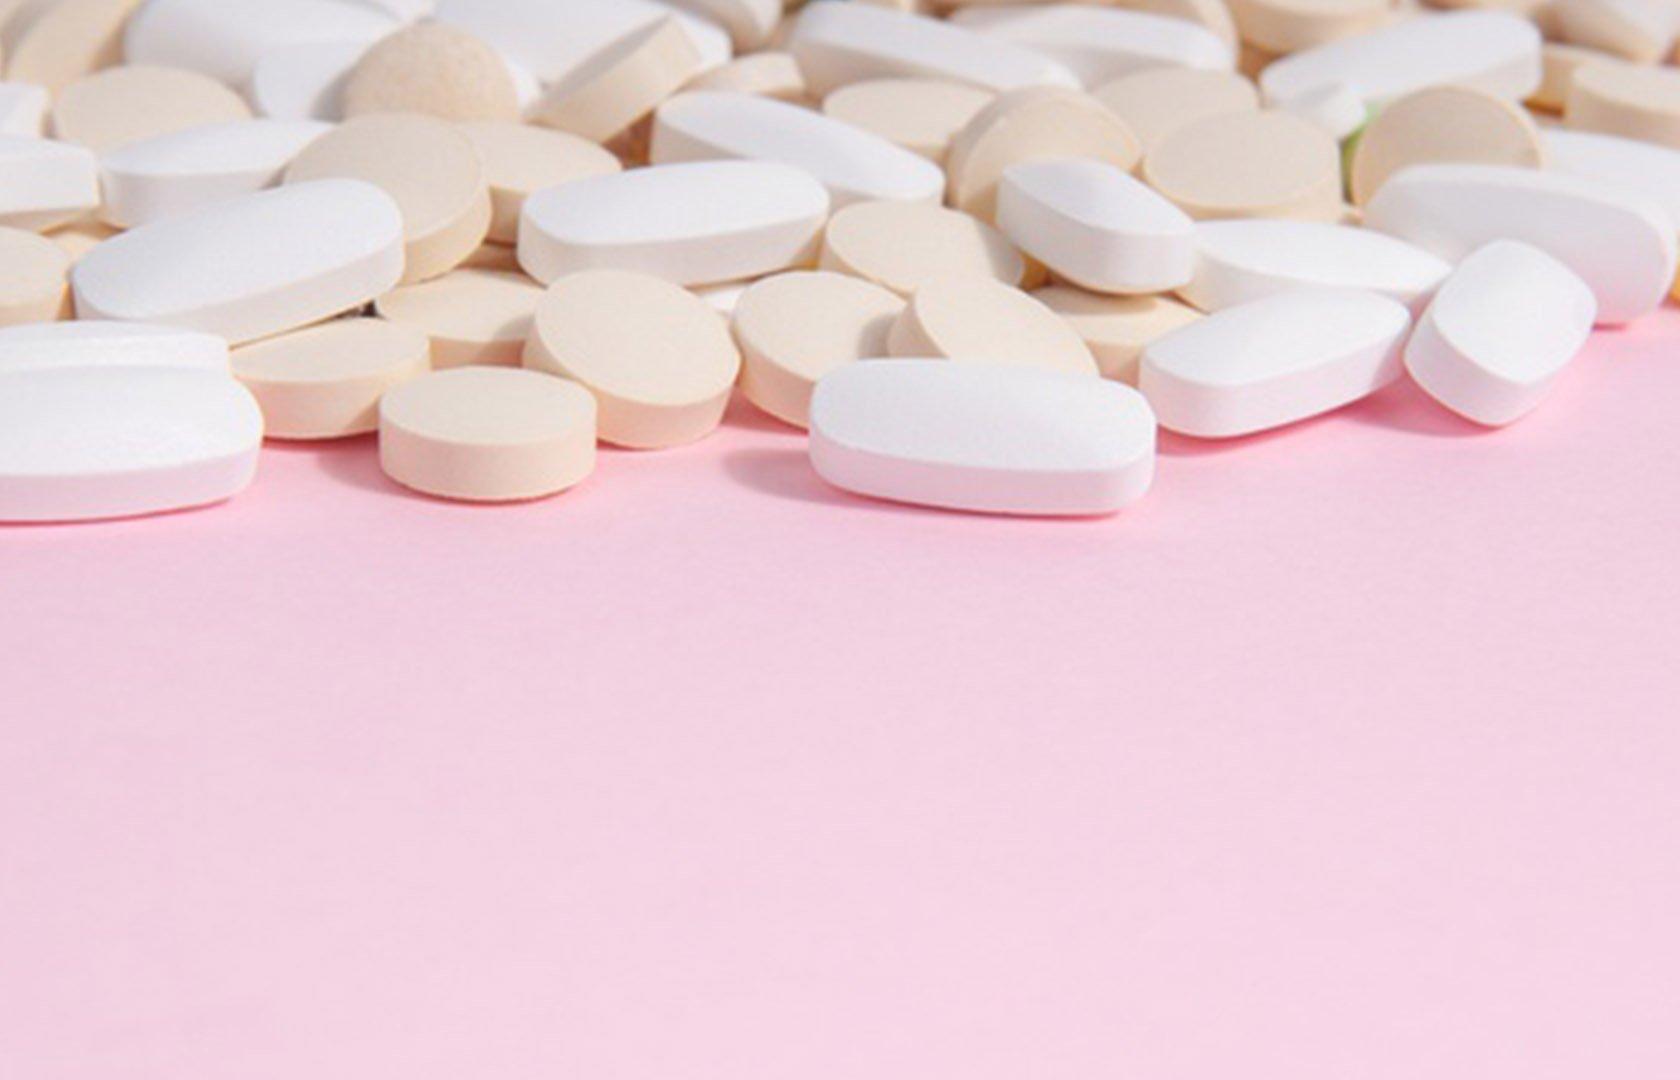 coten-30-mg